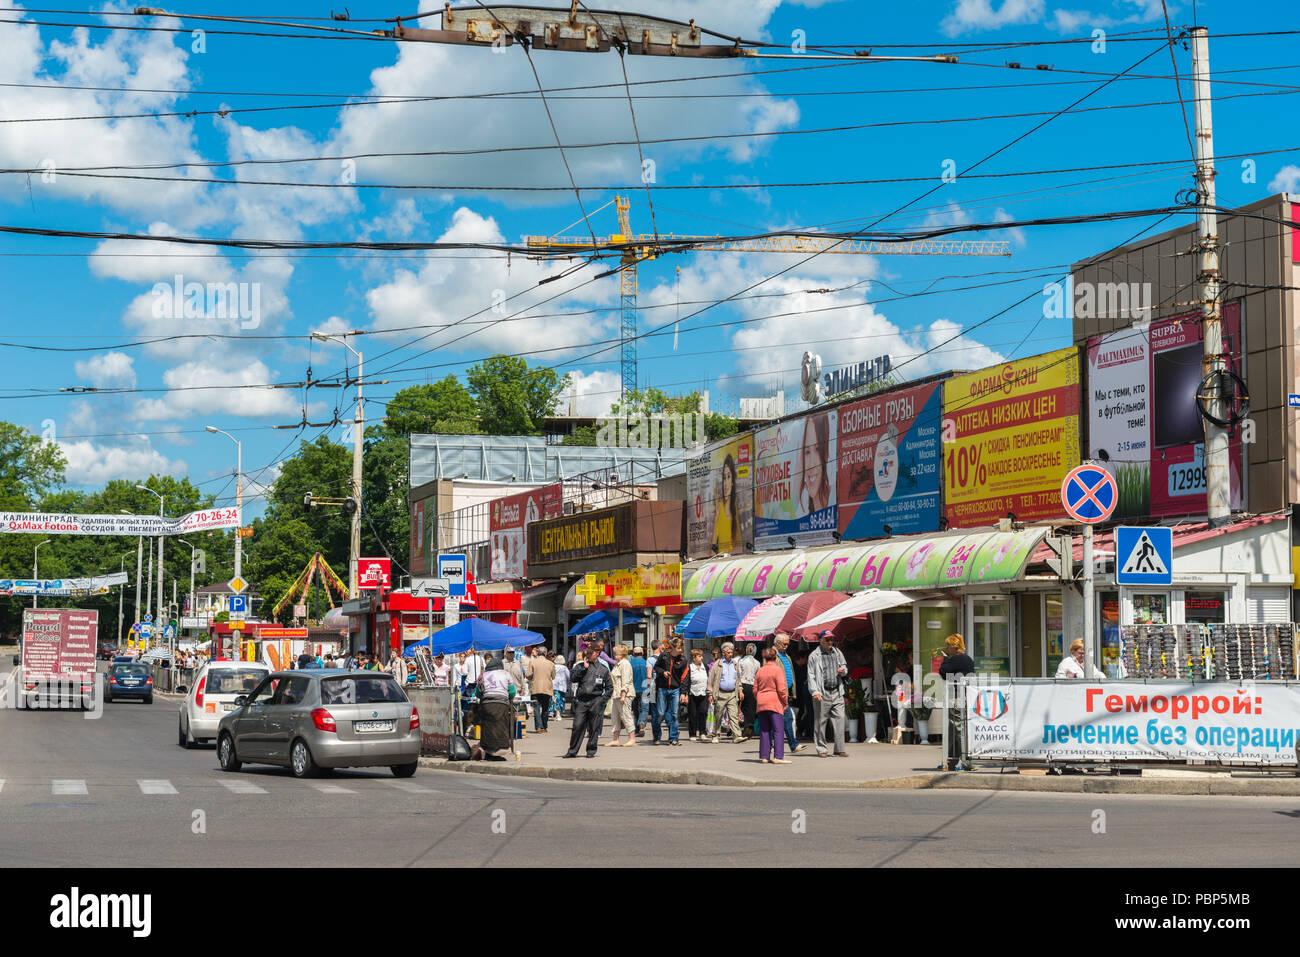 Street outside the City Market Hall, City of Kaliningrad, Oblast, region, Baltic, Russia, Europe - Stock Image